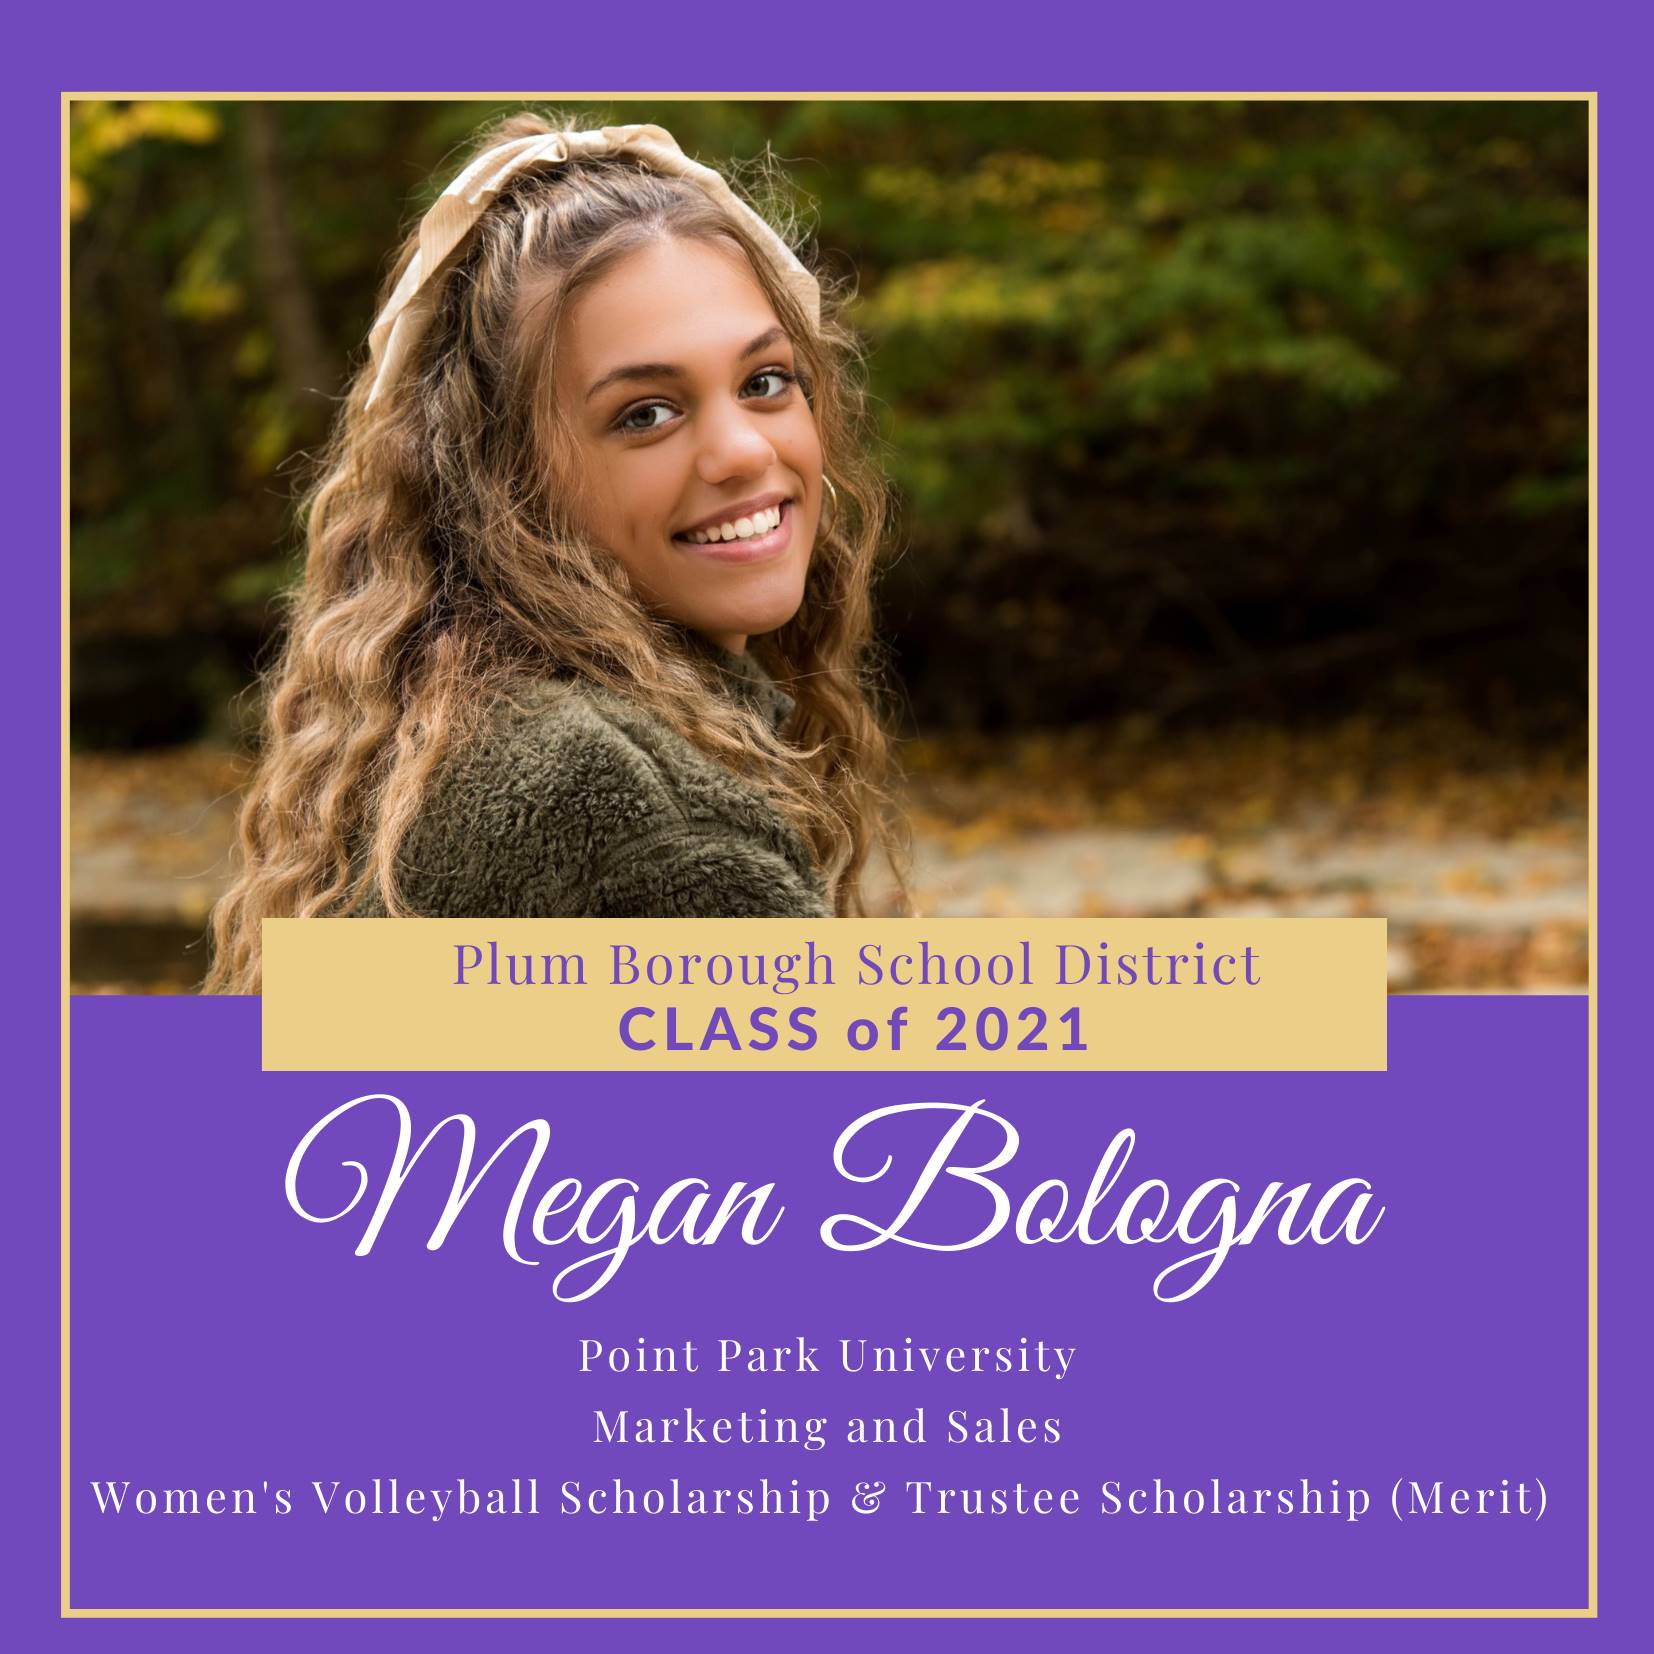 Congratulations to Megan Bologna, Class of 2021!